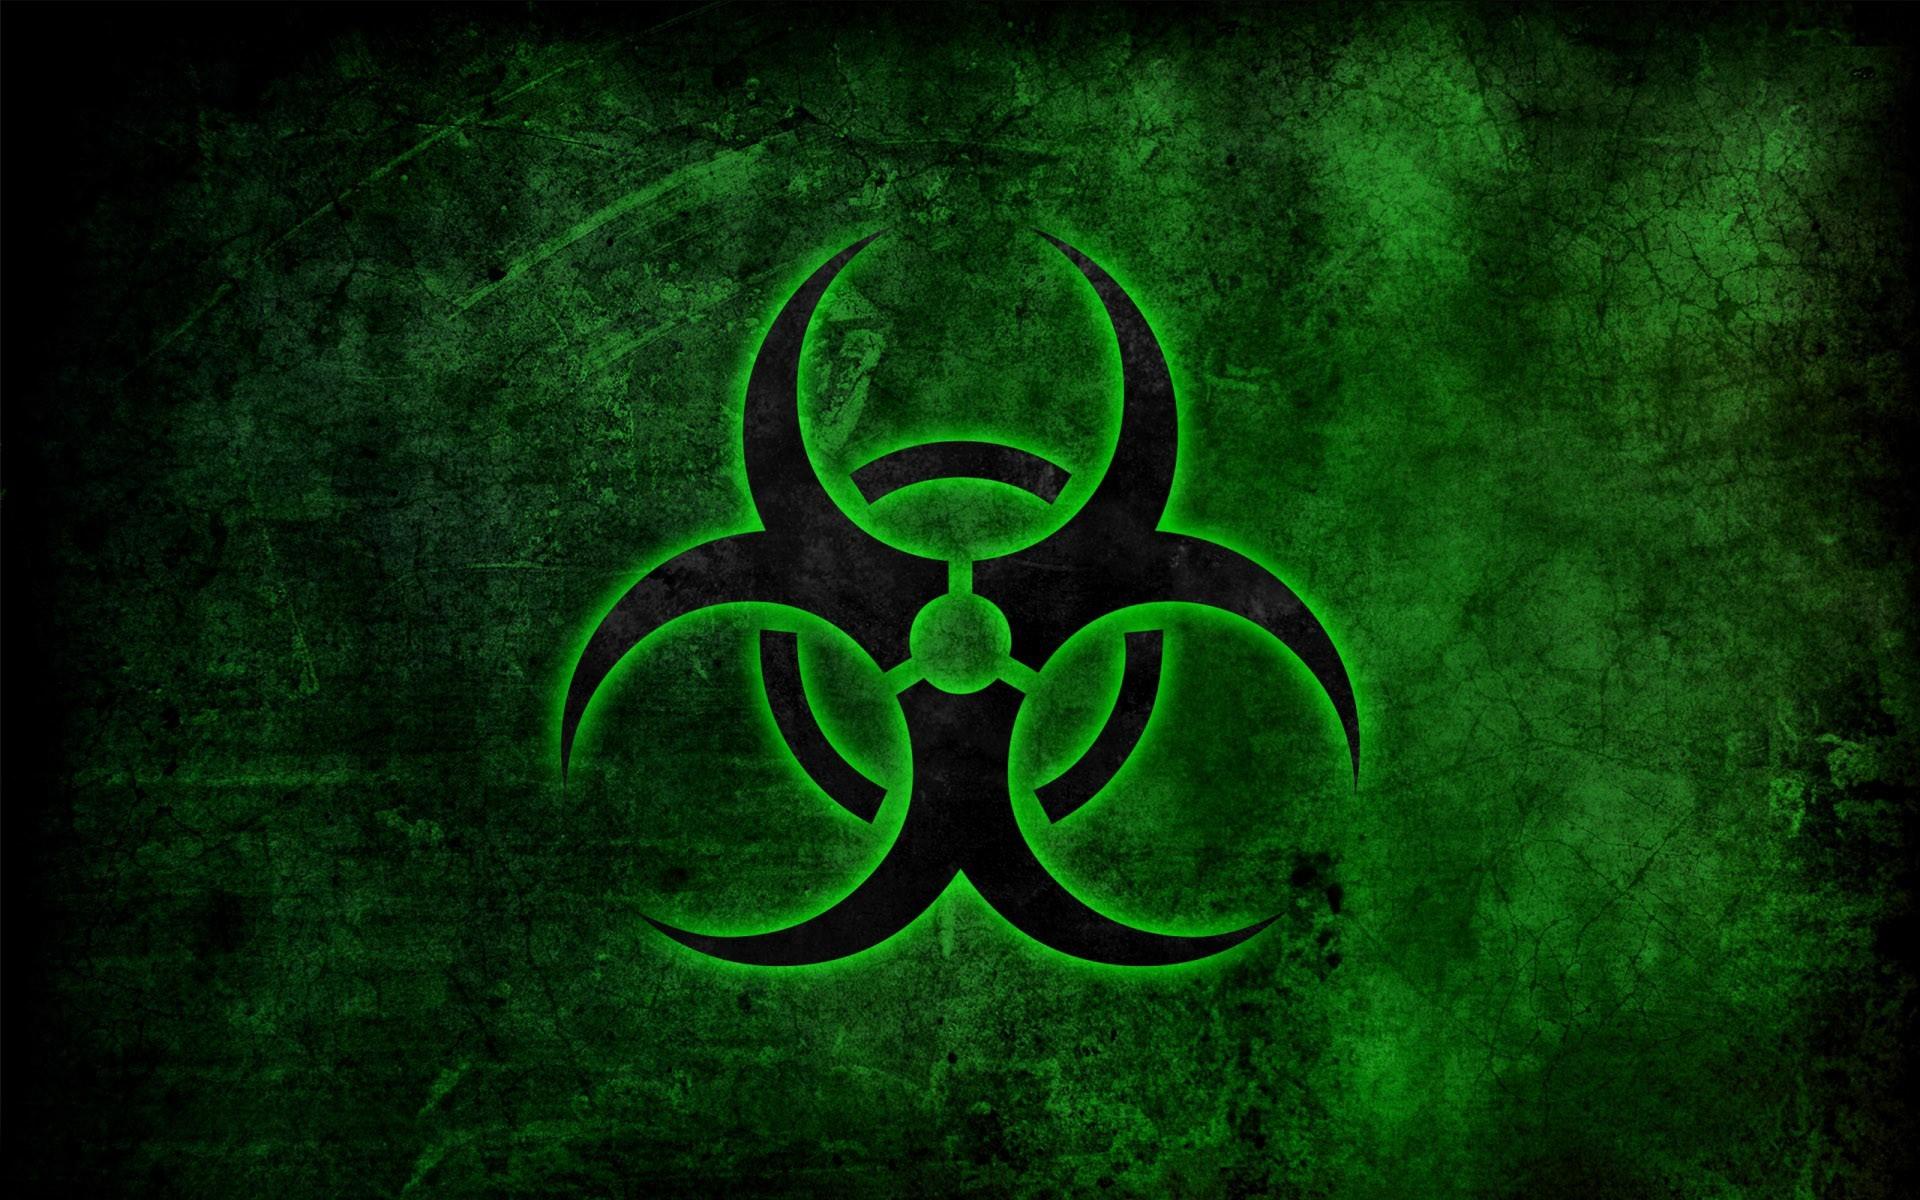 Biohazard symbol wallpaper 10778 1920x1200